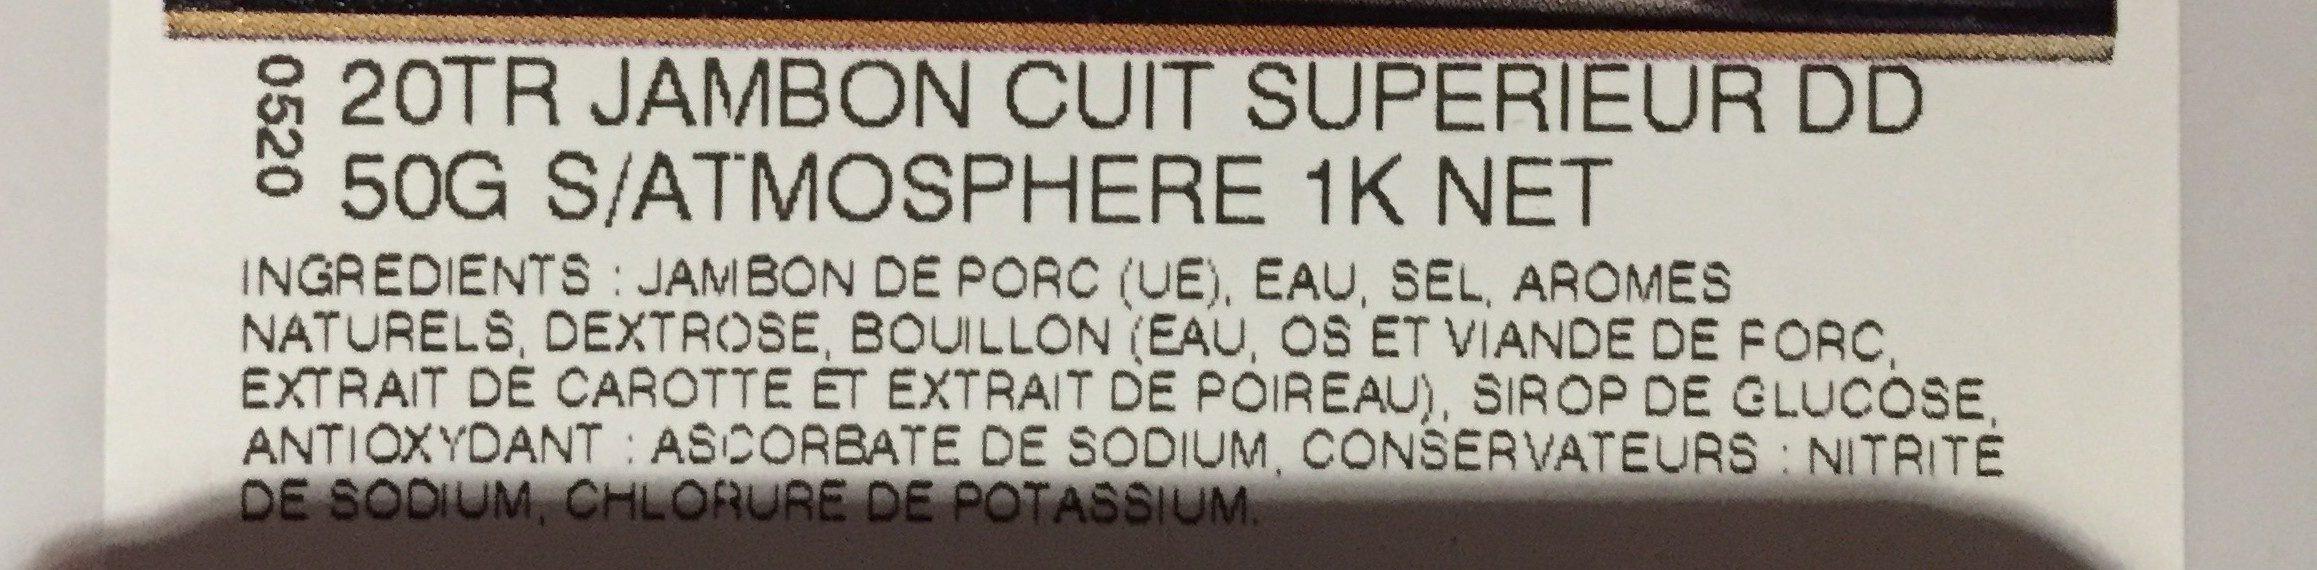 Jambon cuit superieur - Ingrediënten - fr